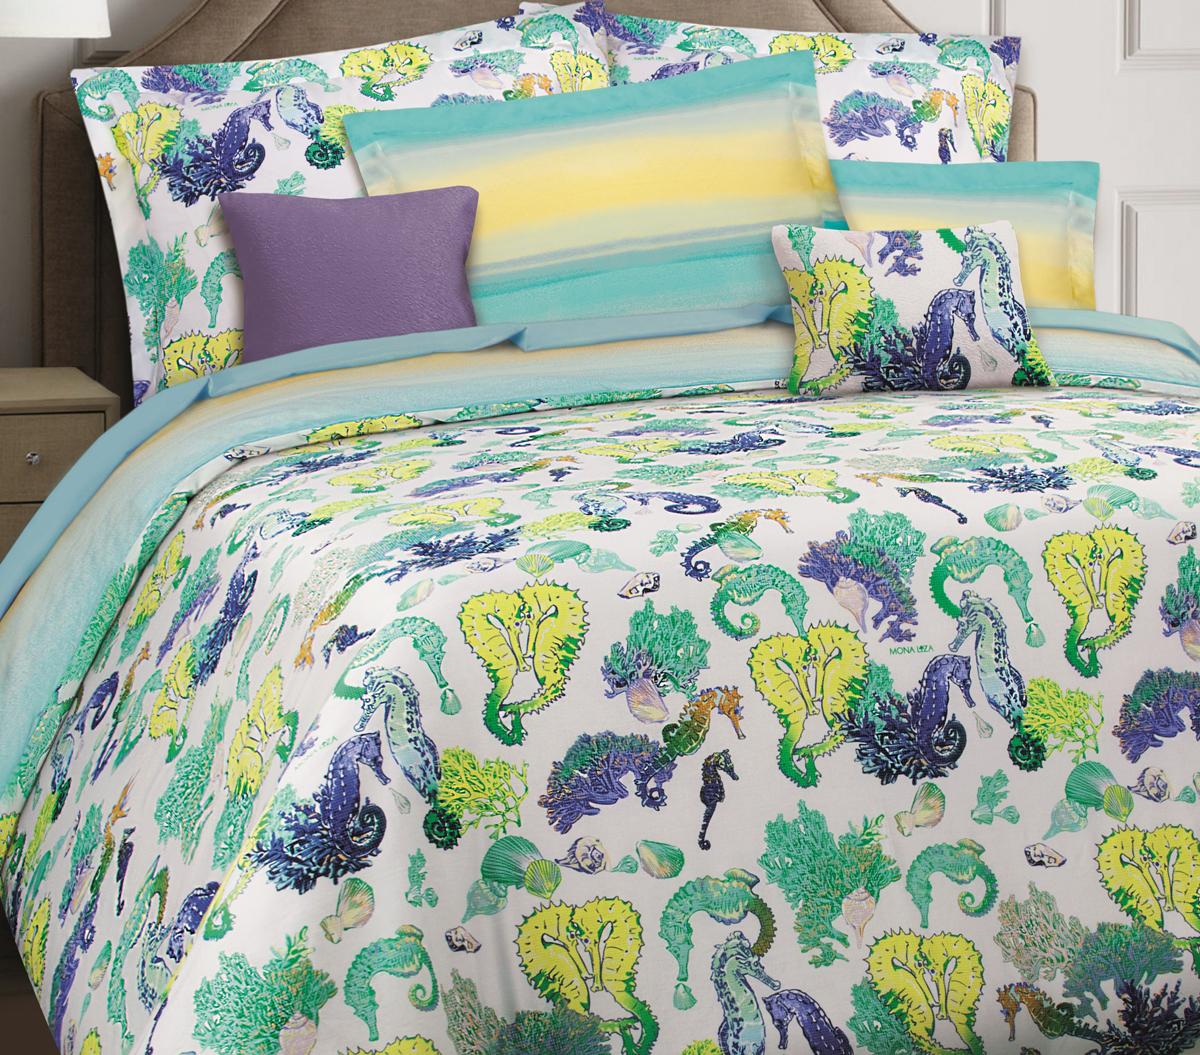 Комплект белья Mona Liza Premium Atelier Sirena, 2-спальный, наволочки 50х70, 70х70. 5044-0014 цена